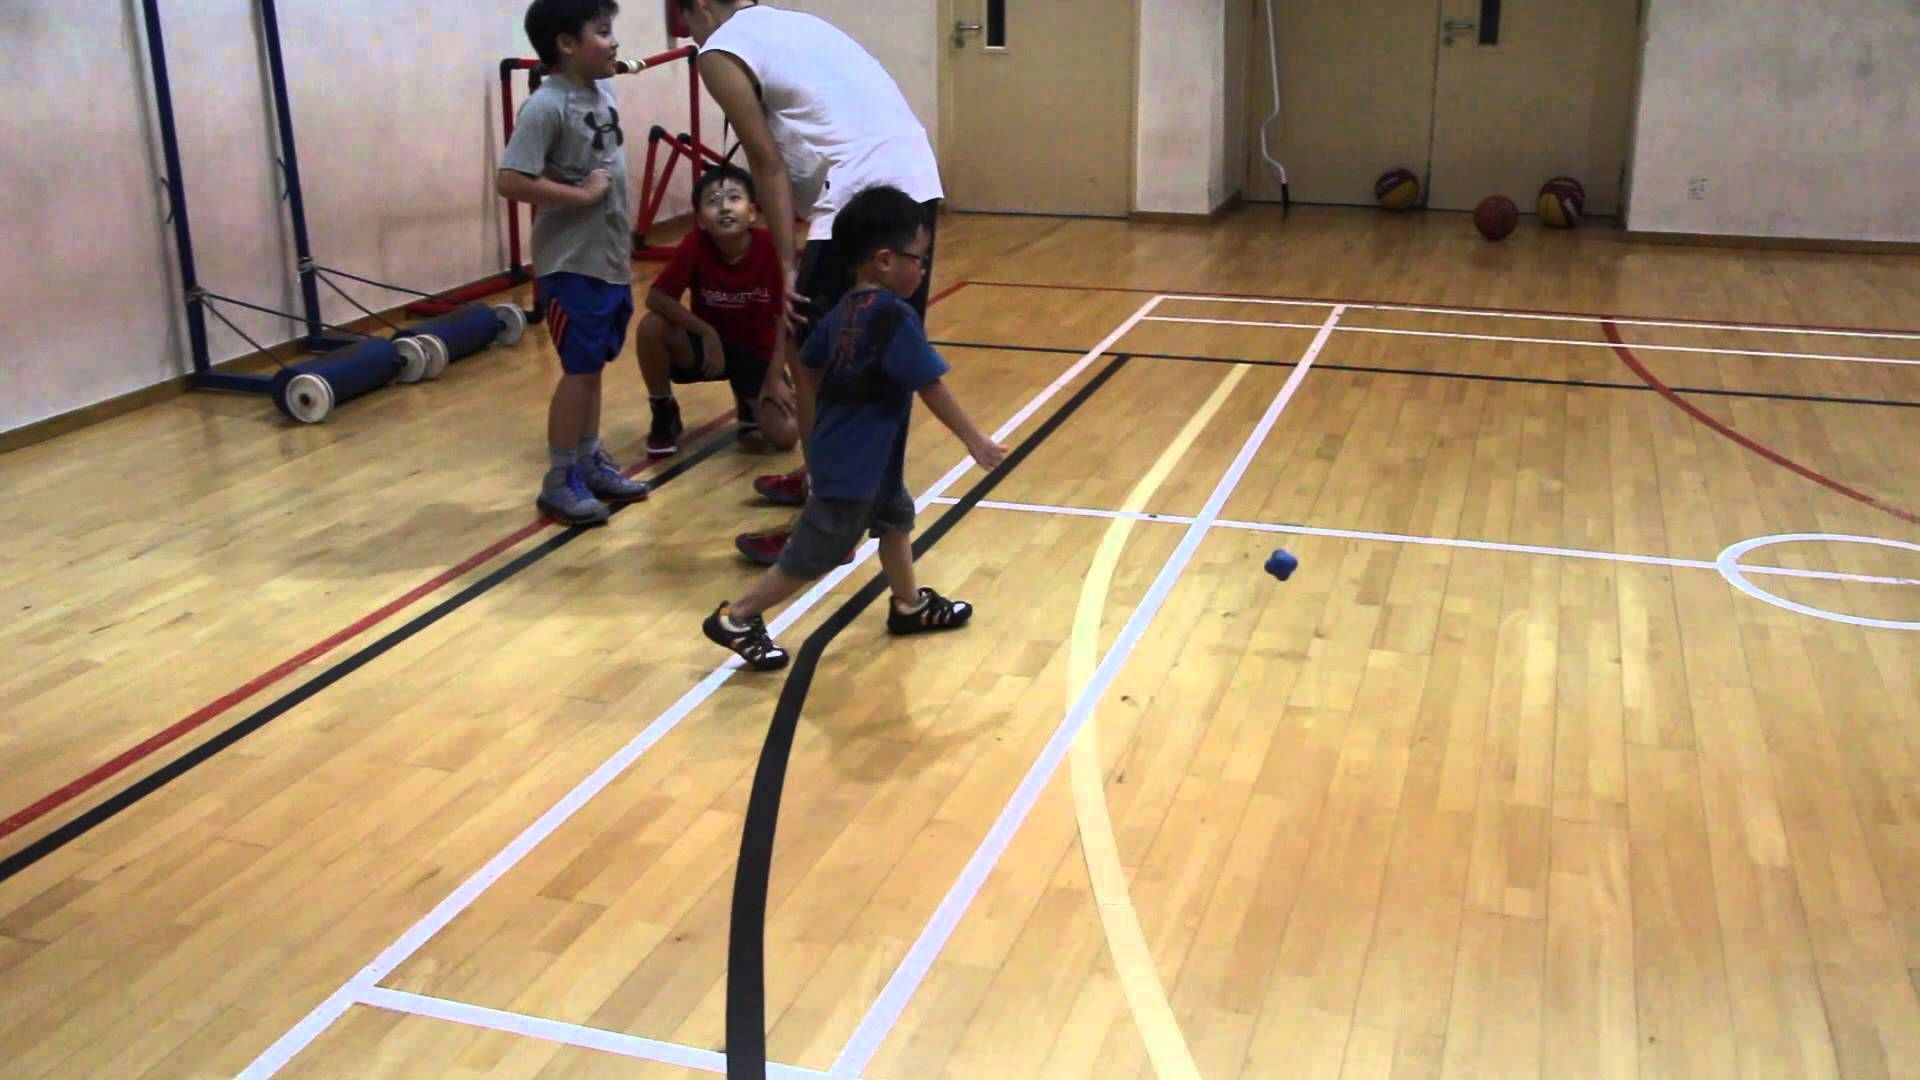 Basketball Training Lesson Singapore Basketball Startyoung Sgbasketball Singaporebasketball Sgbball Basketball Training Basketball Information Basketball